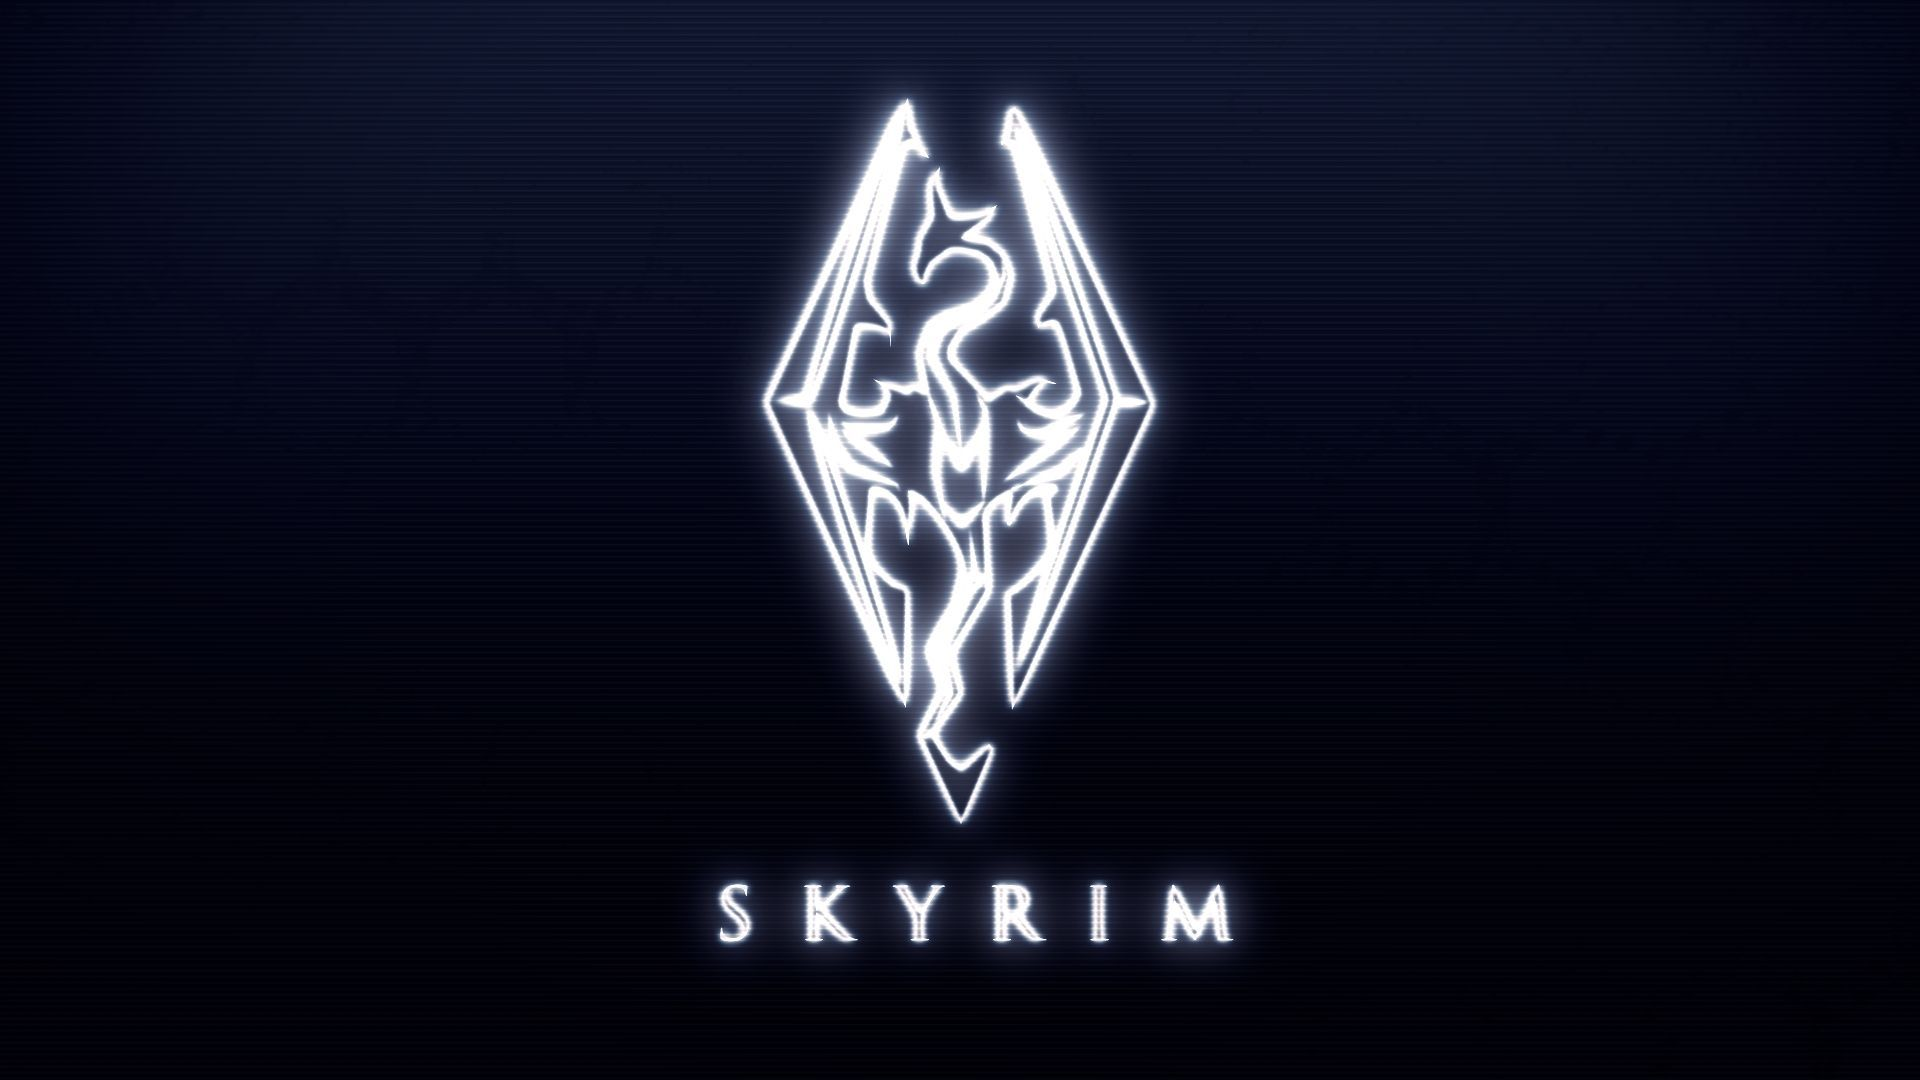 Skyrim Logo Wallpapers Top Free Skyrim Logo Backgrounds Wallpaperaccess Skyrim Elder Scrolls V Skyrim Hd Wallpaper